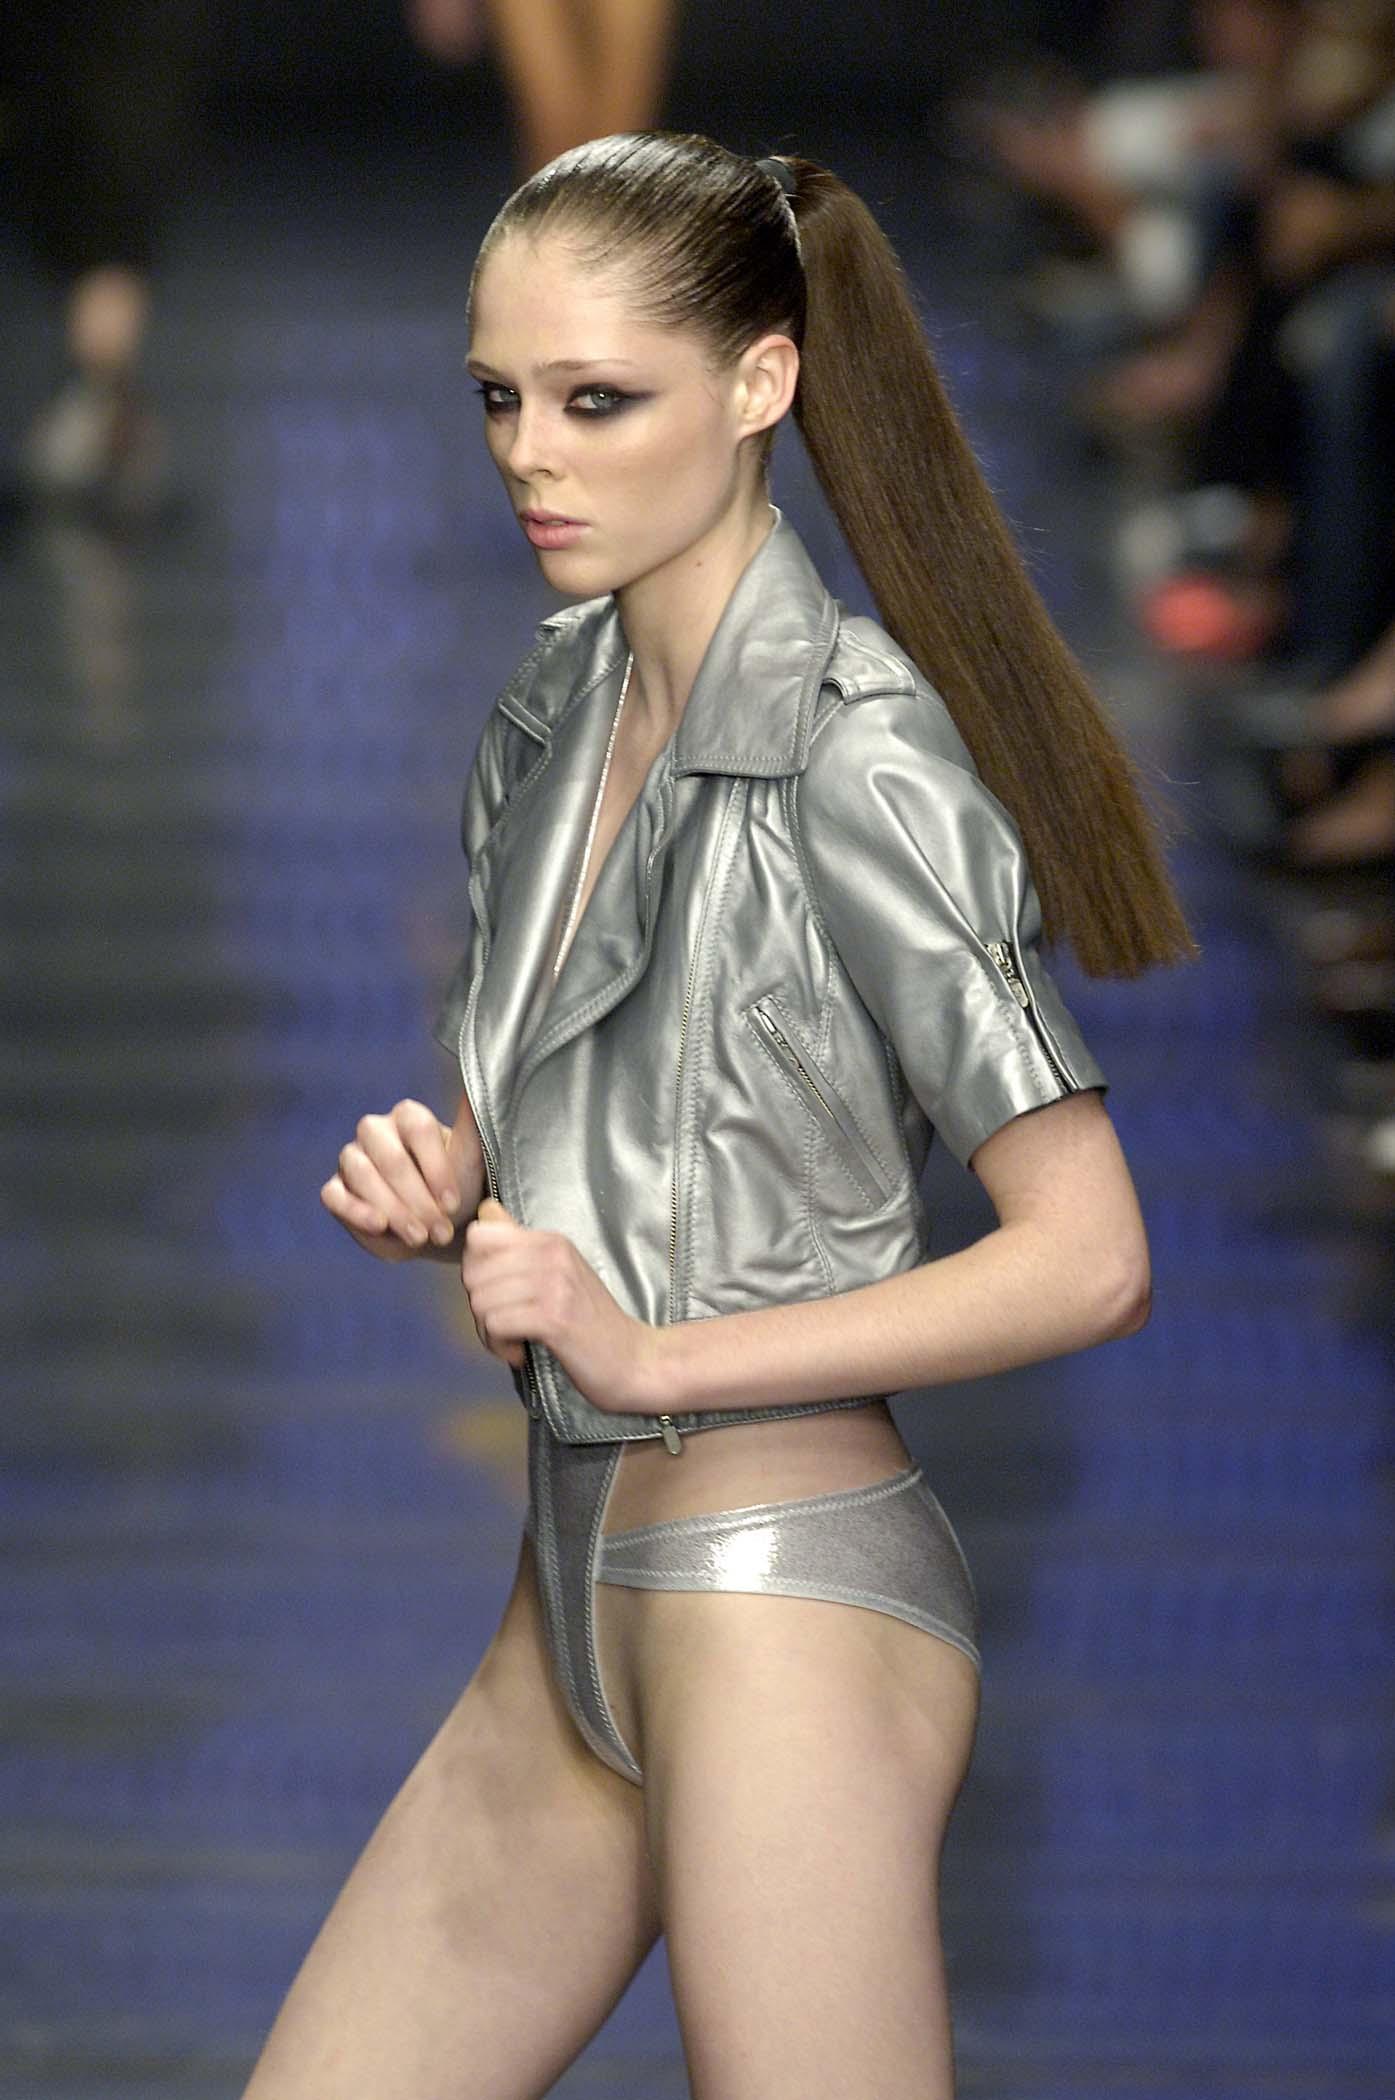 Coco Rocha nackt nackt, Topless vollschlanker Frauenakt